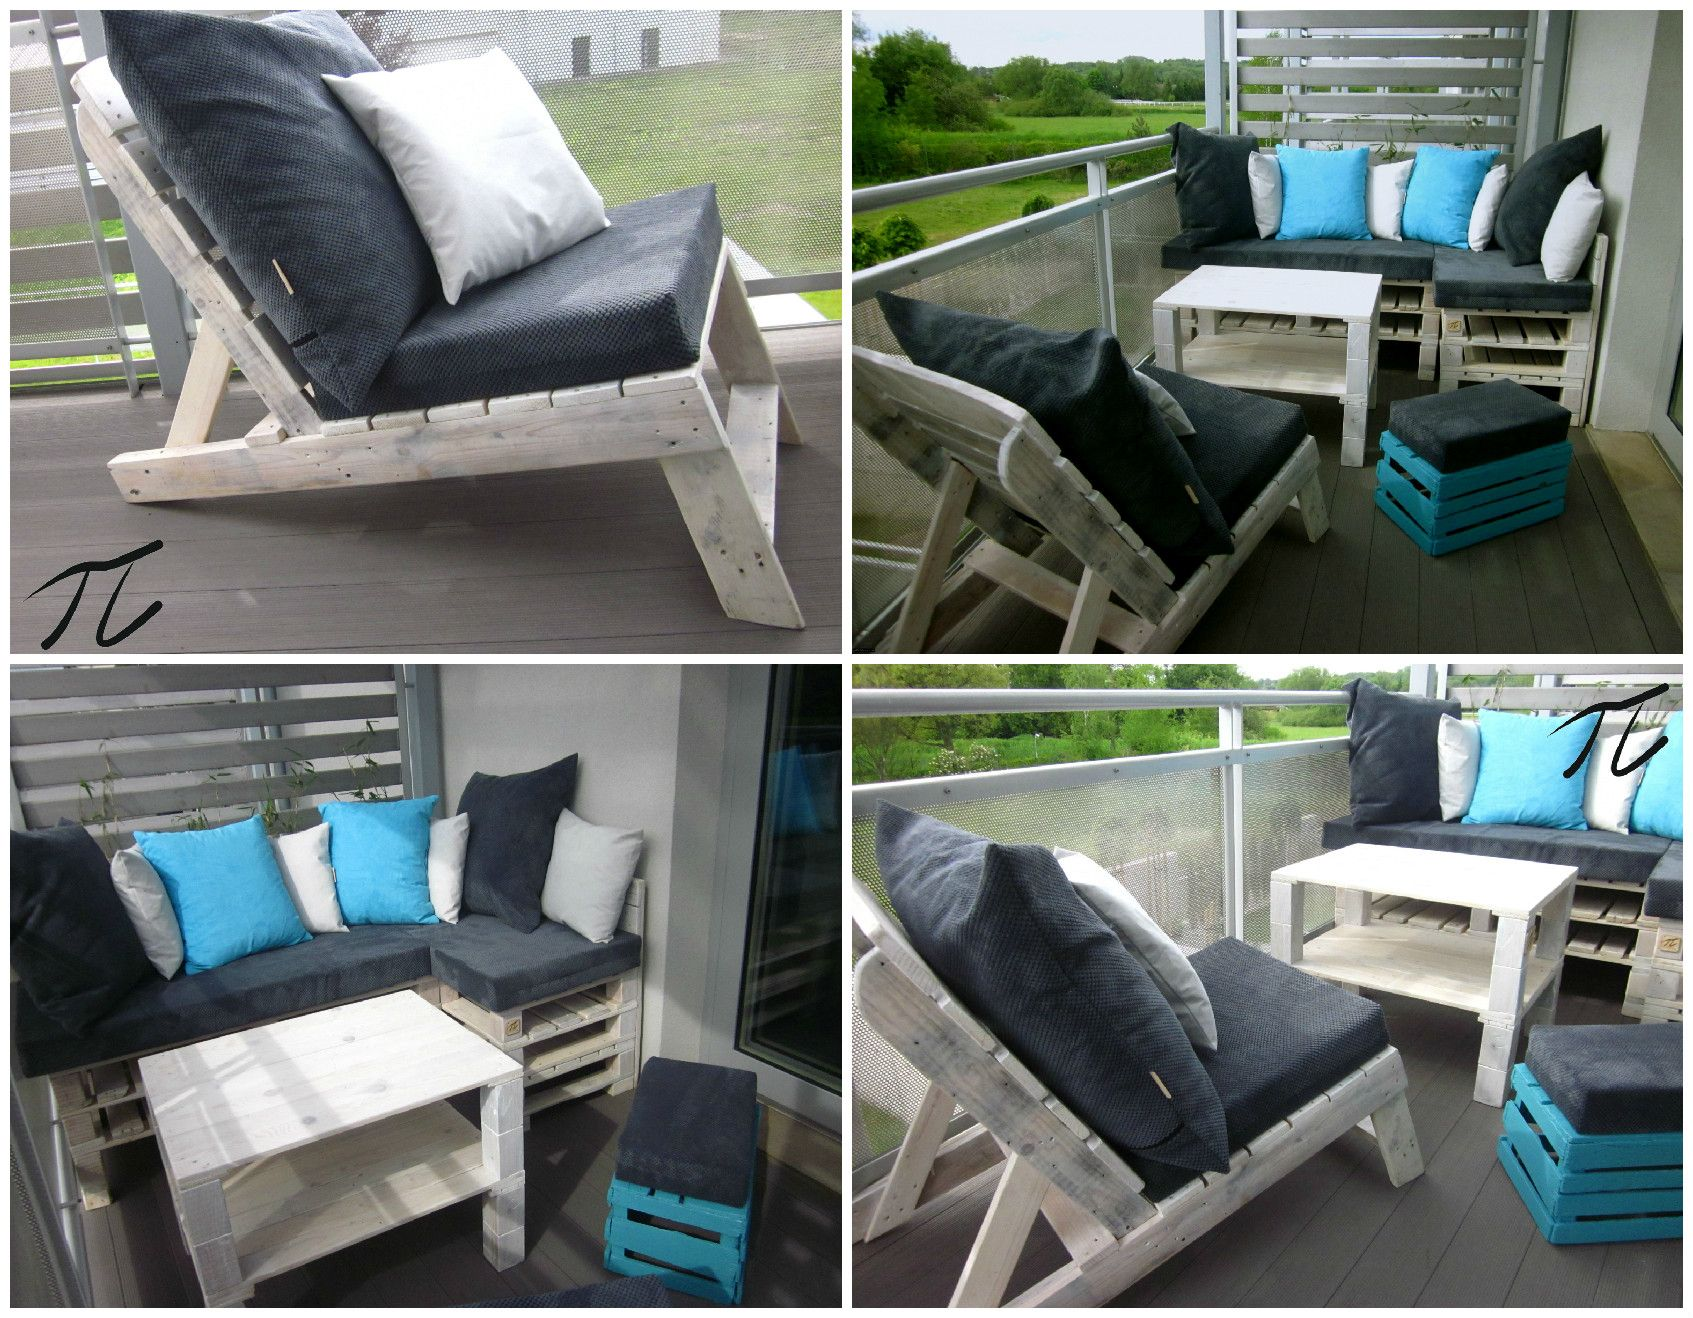 Upcycled Pallet Terrace Design Terrace Design Pallet Furniture Designs Pallet Furniture Plans